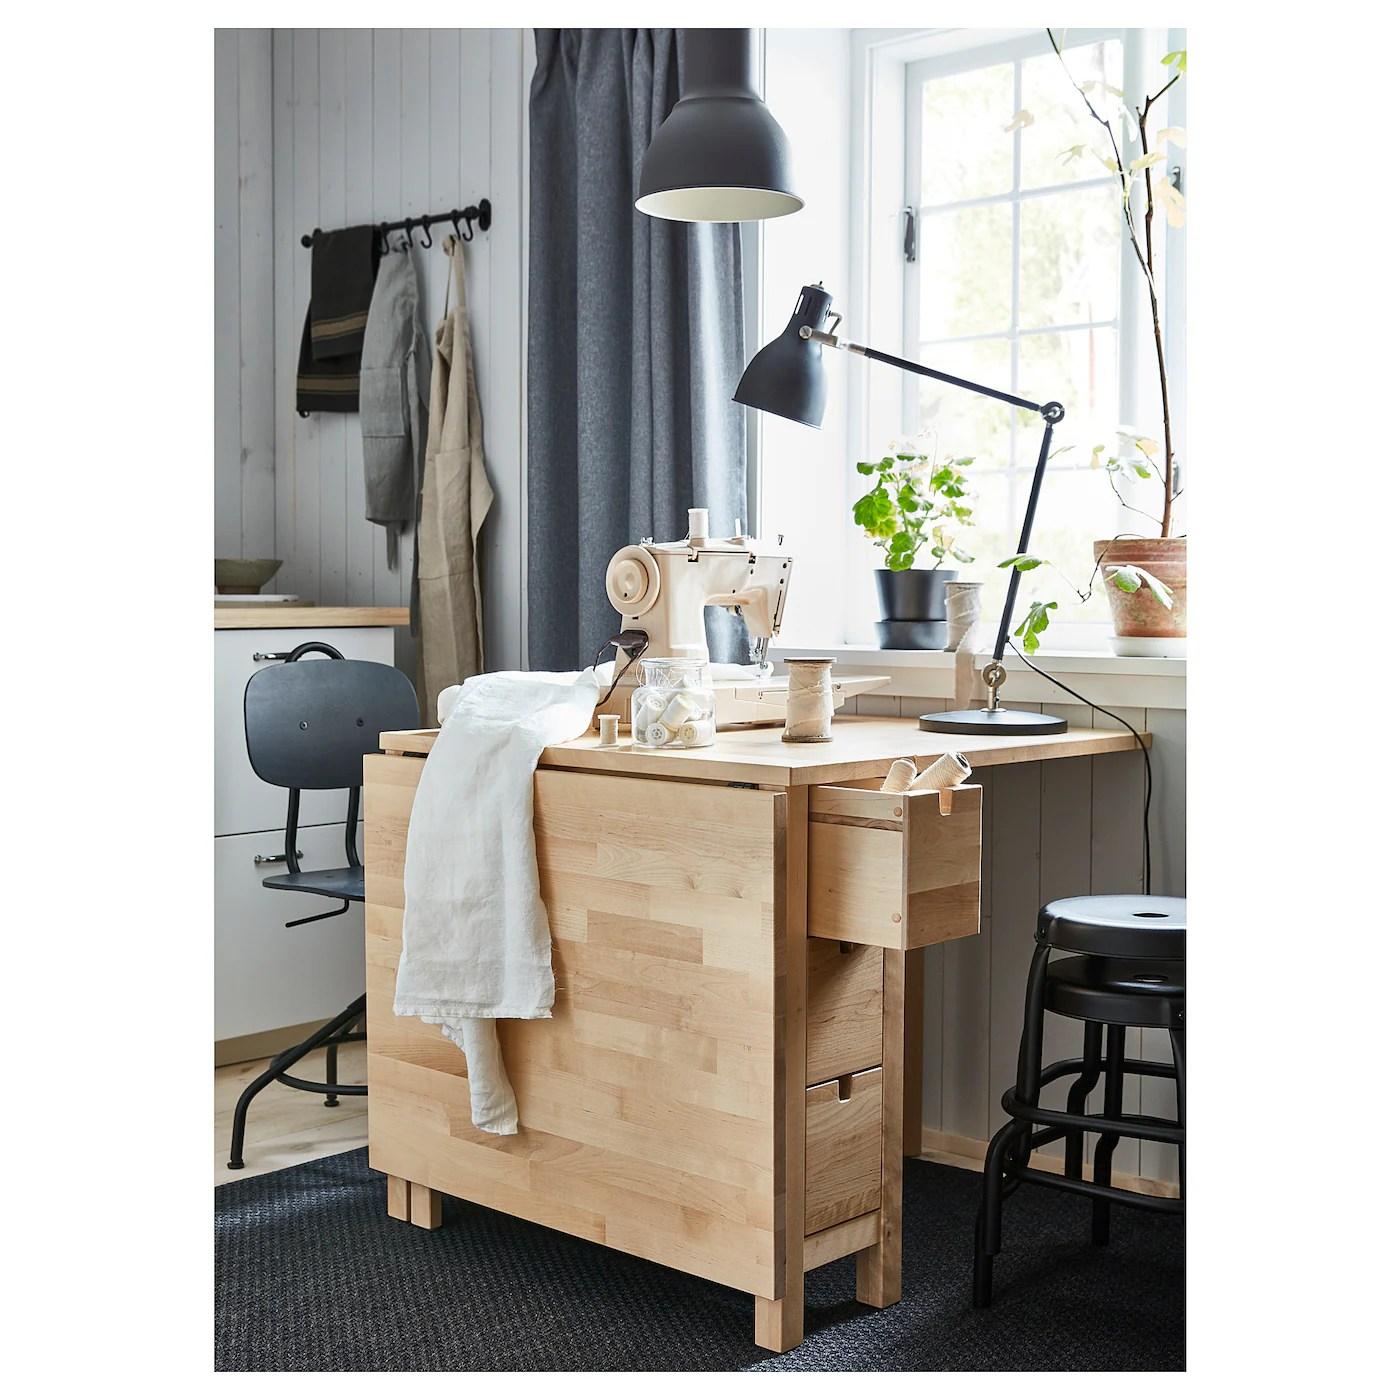 Norden Birch Gateleg Table Ikea